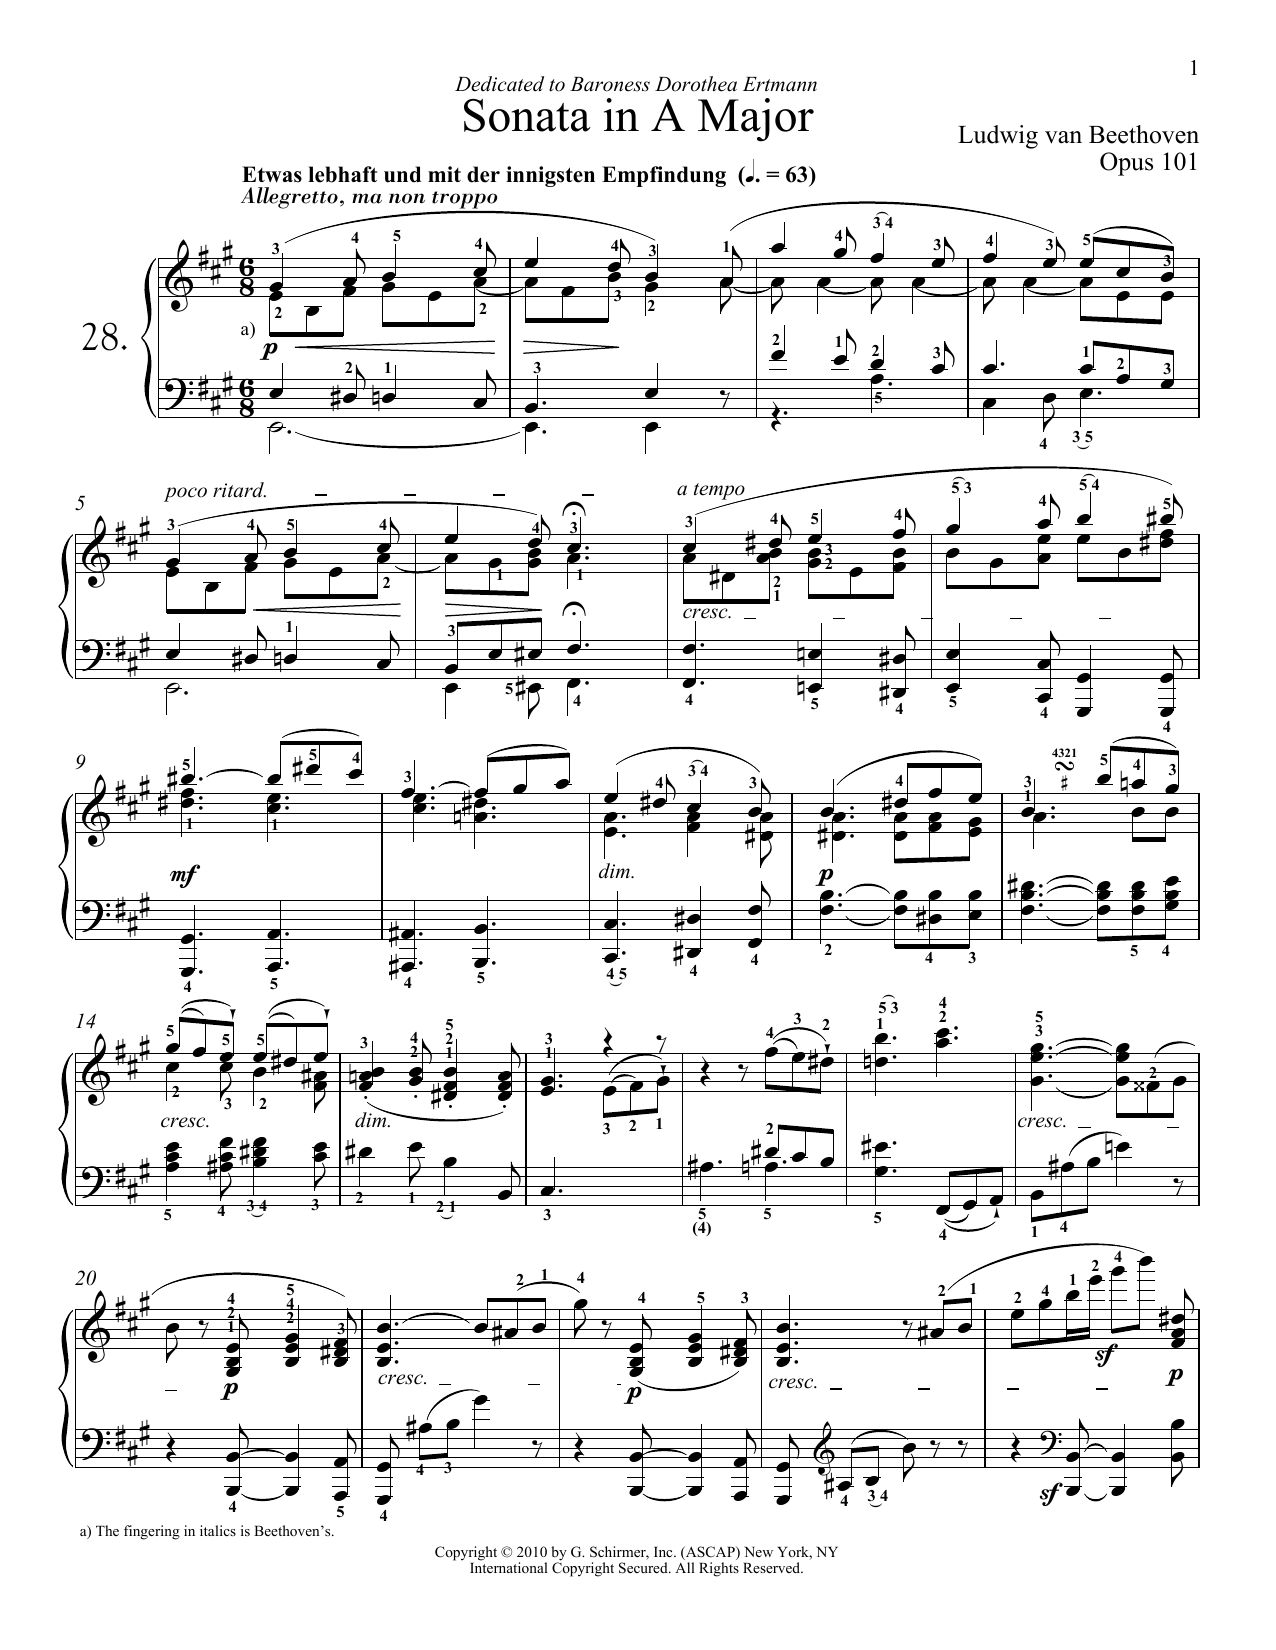 Ludwig van Beethoven Piano Sonata No. 28 In A Major, Op. 101 sheet music notes and chords